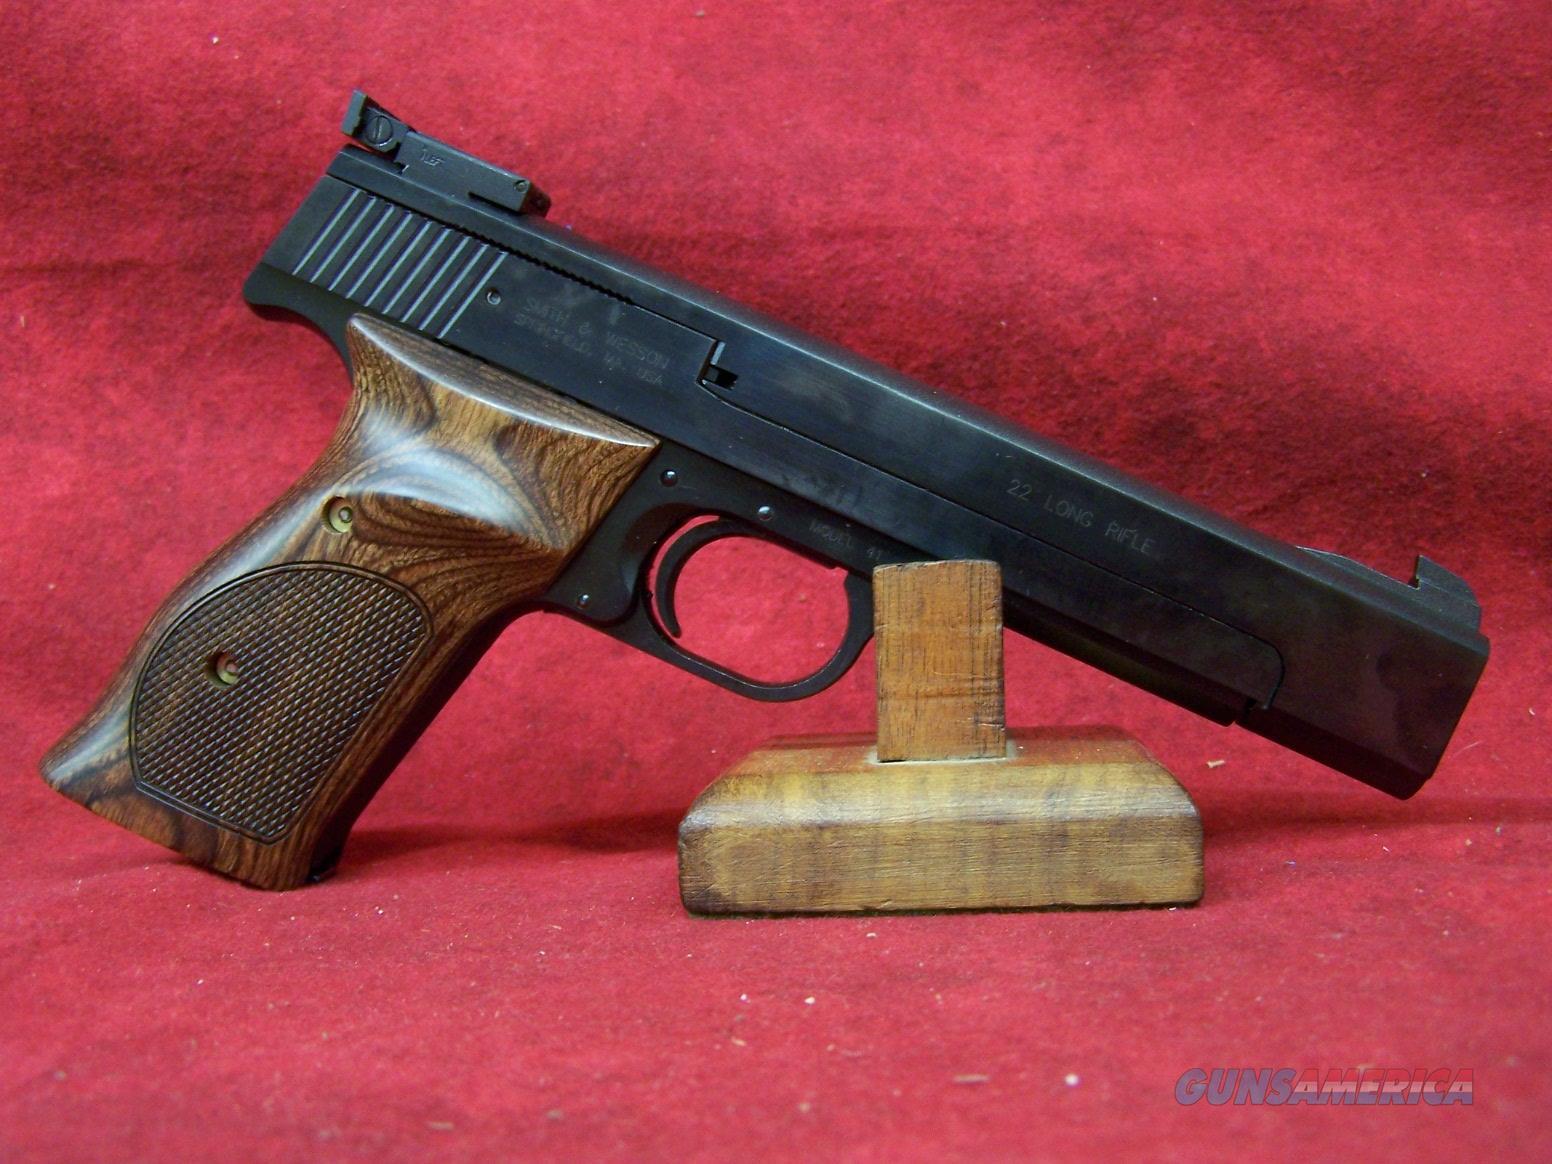 "Smith & Wesson 41 22LR 5.5"" Barrel (130511)  Guns > Pistols > Smith & Wesson Pistols - Autos > .22 Autos"